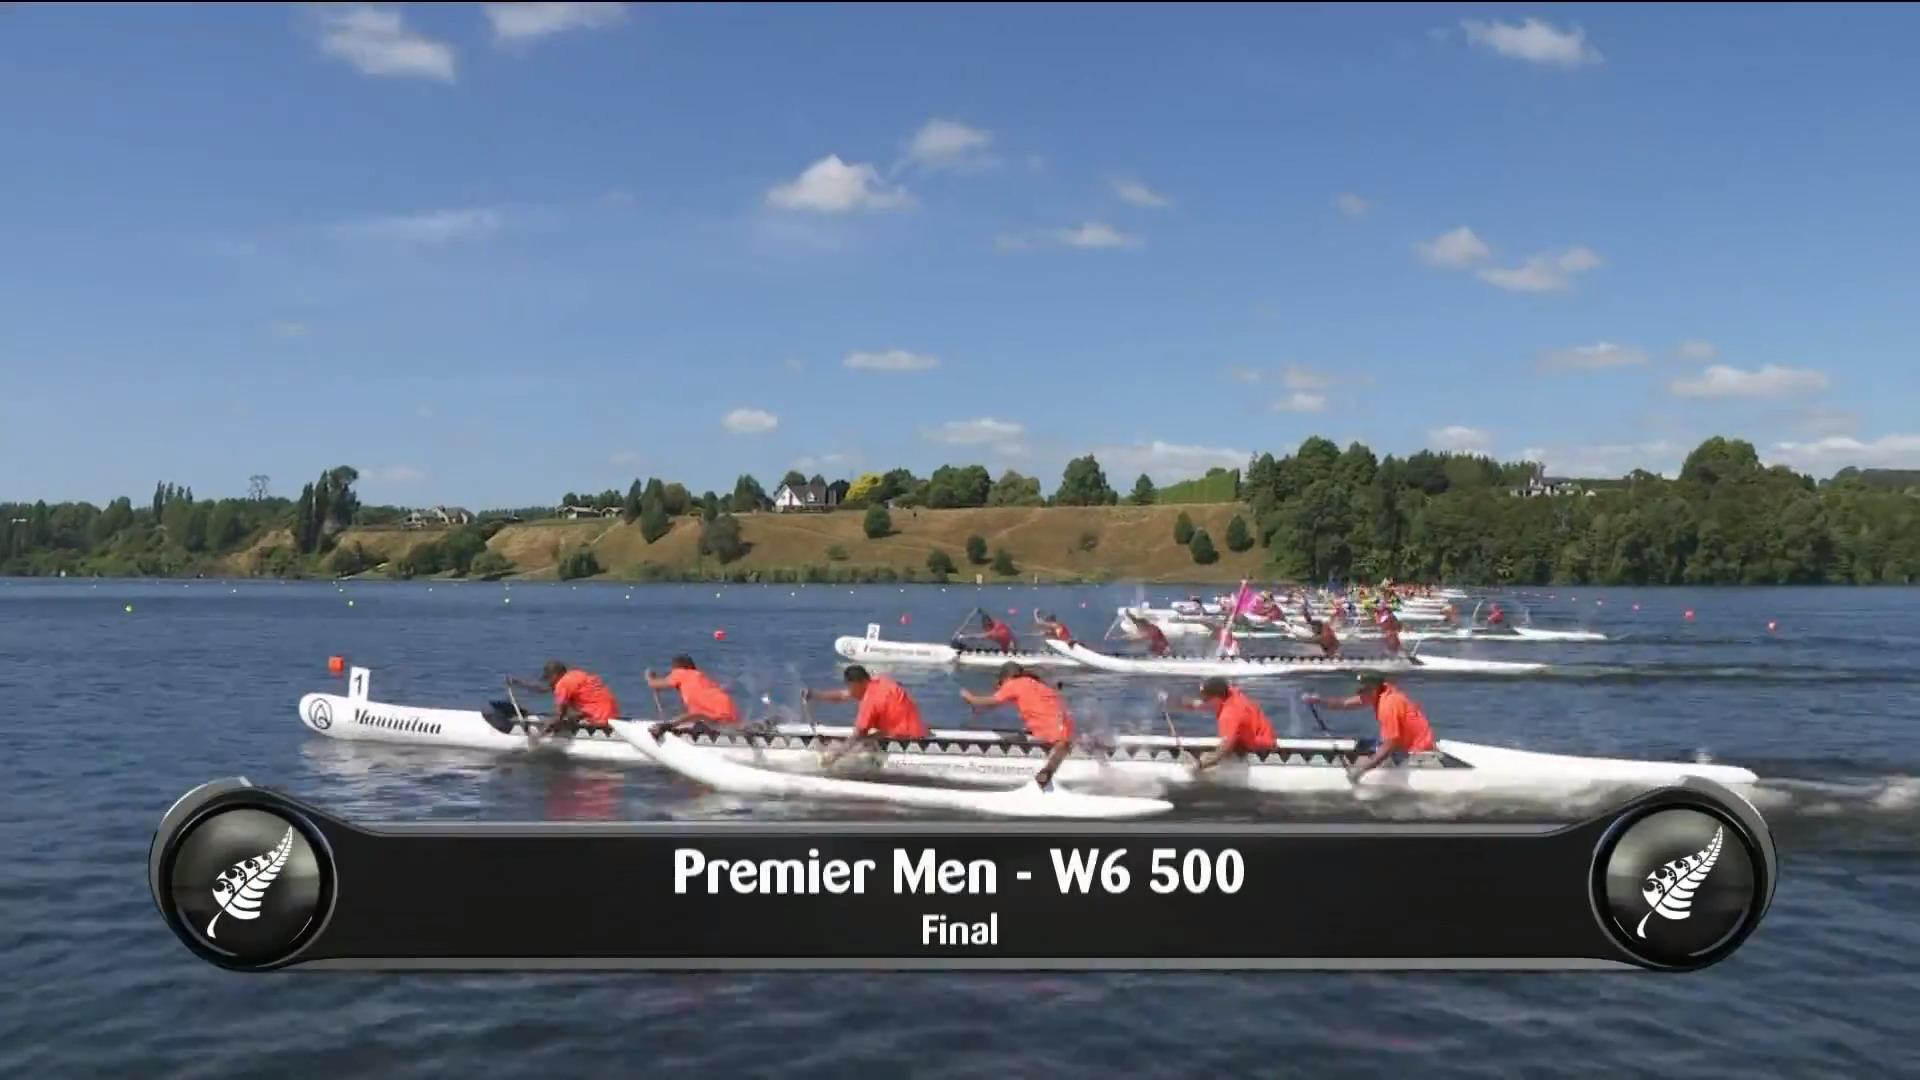 Video for 2019 Waka Ama Sprints - Premier Men - W6 500 Final